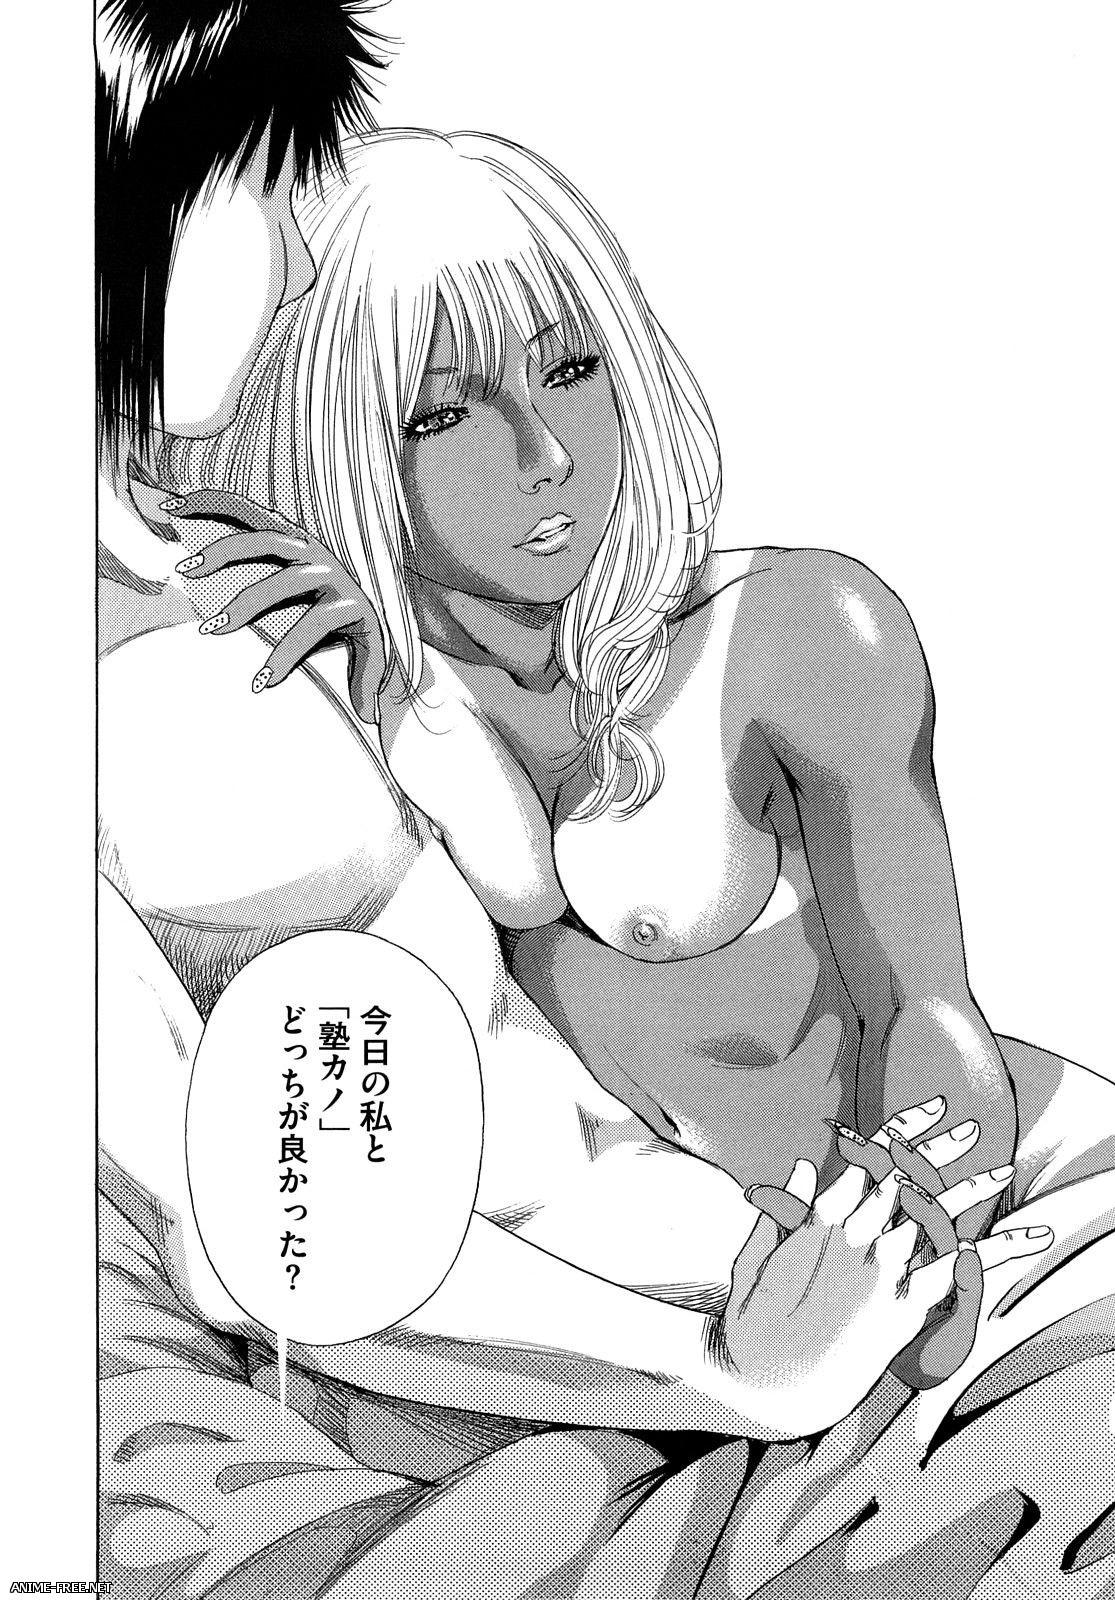 TAKUMI - Сборник хентай манги [Cen] [JAP,ENG] Manga Hentai